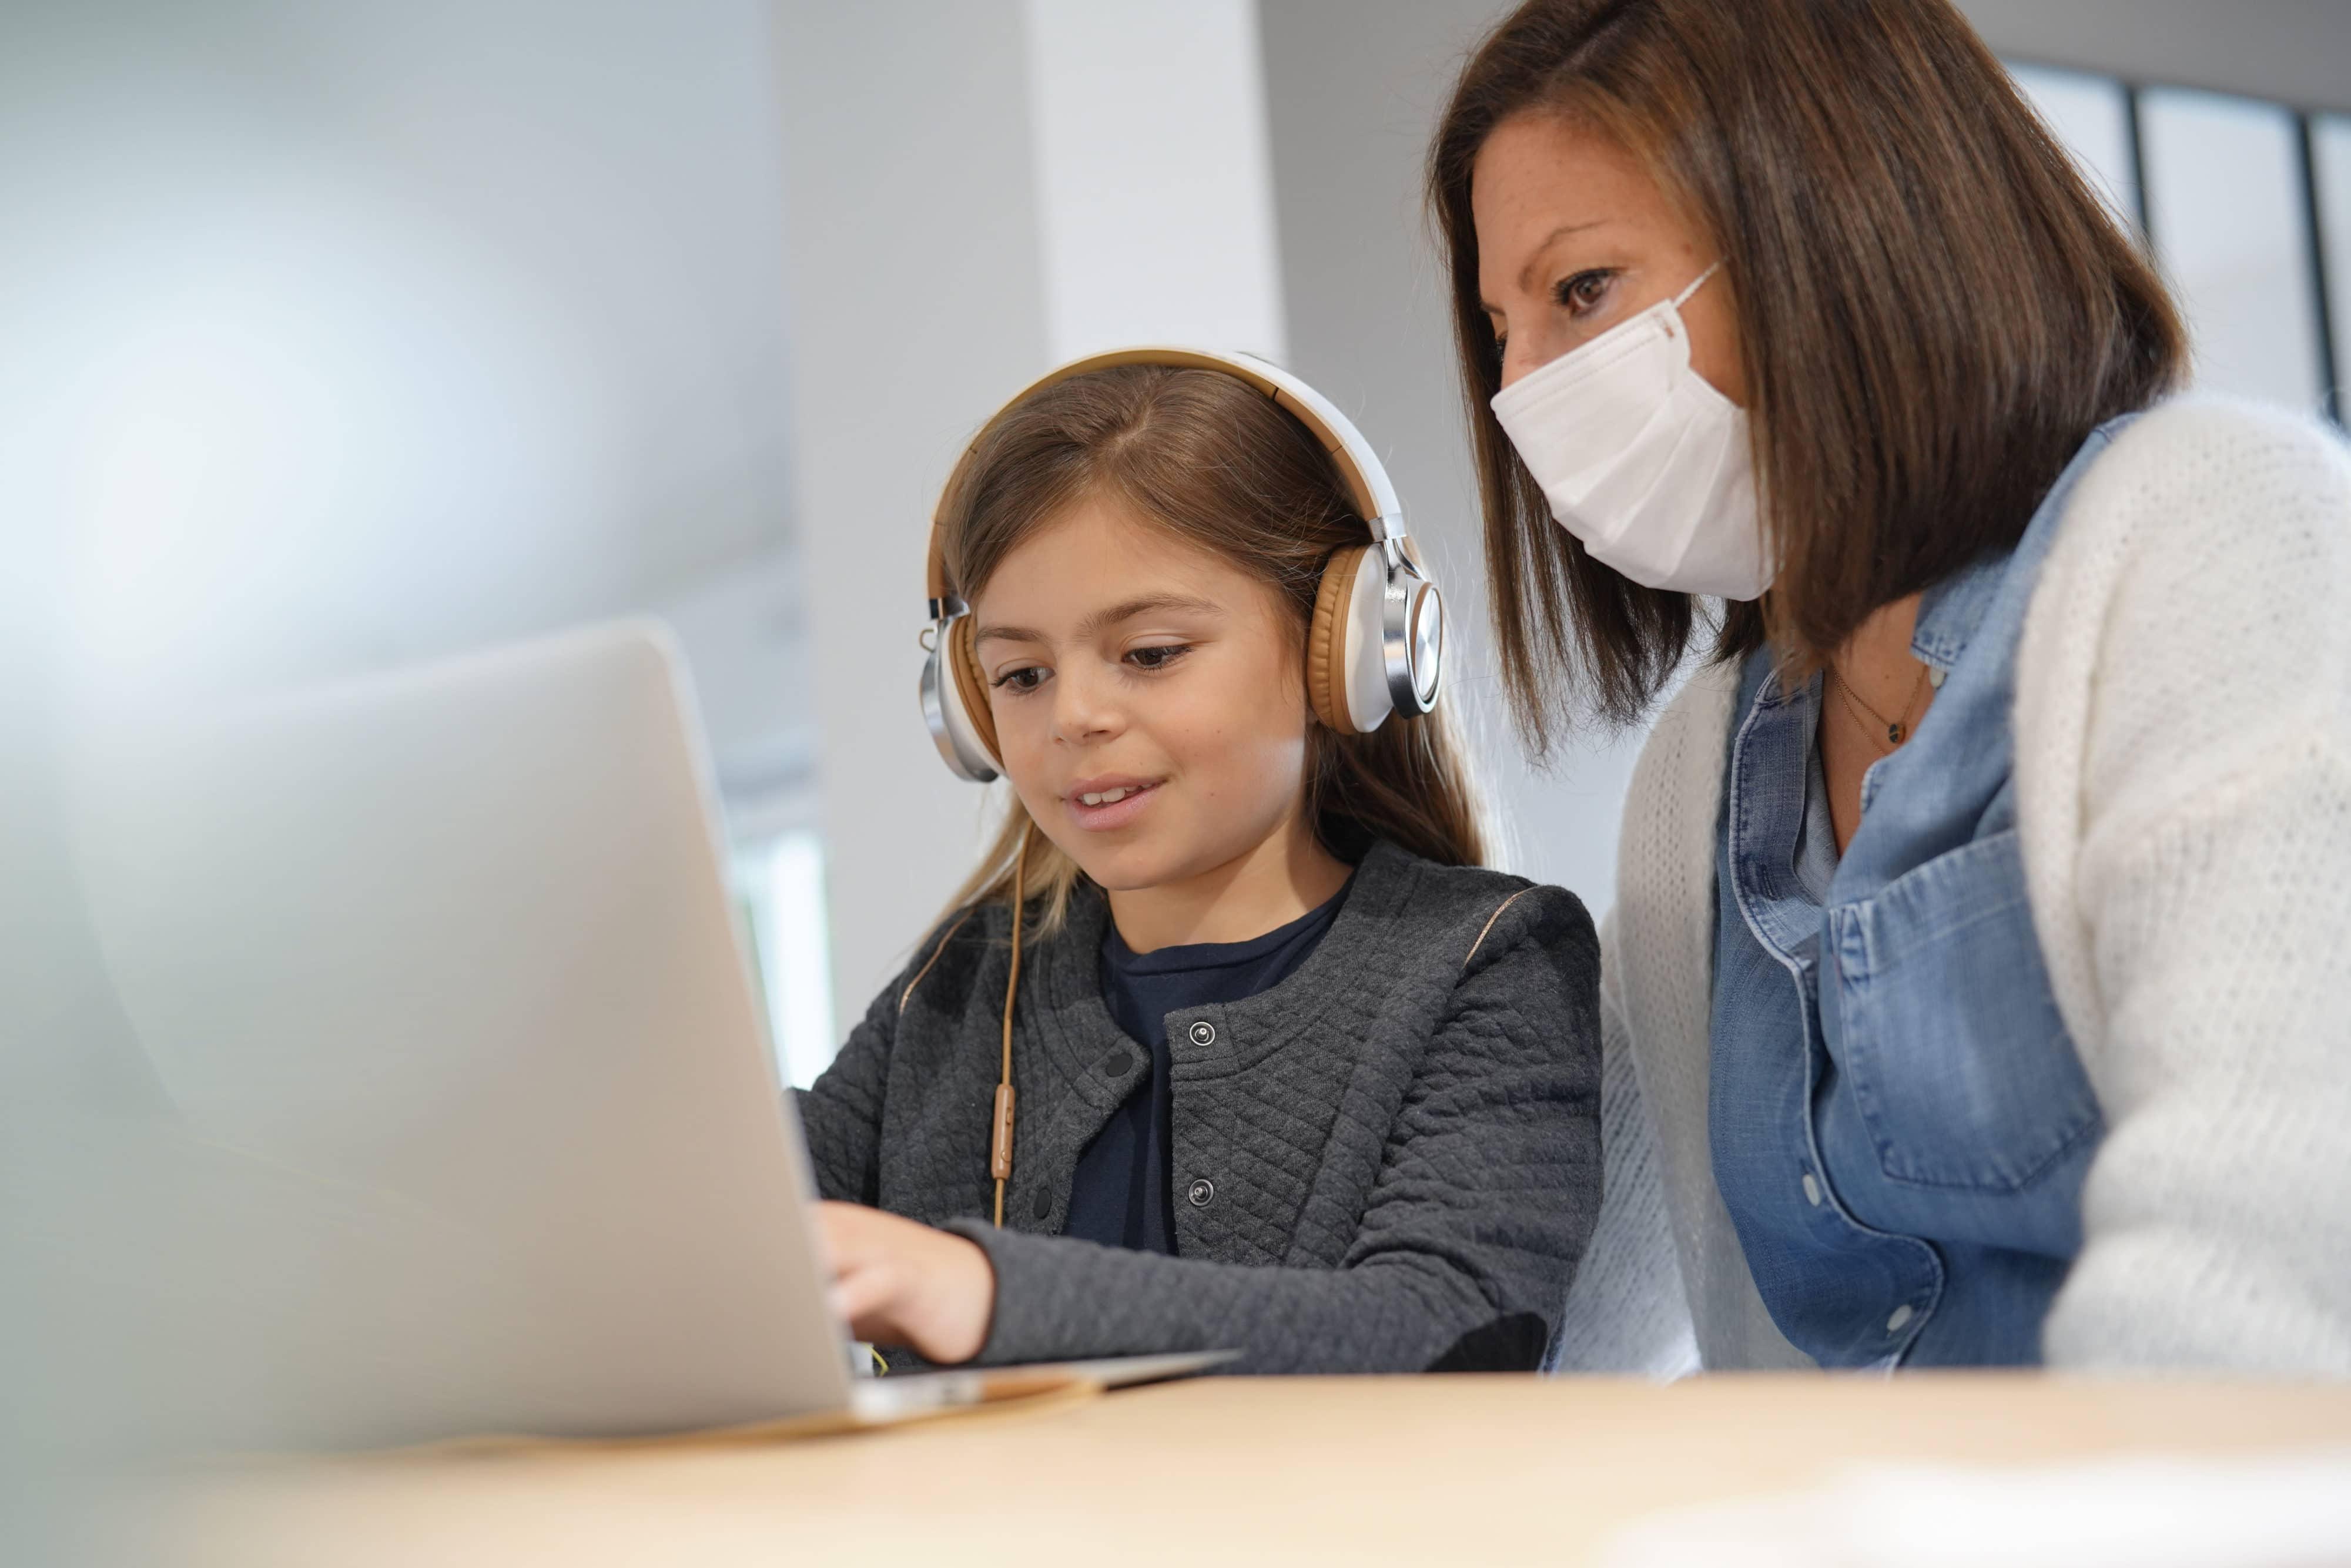 coronavirus-education-4000x2668.jpeg